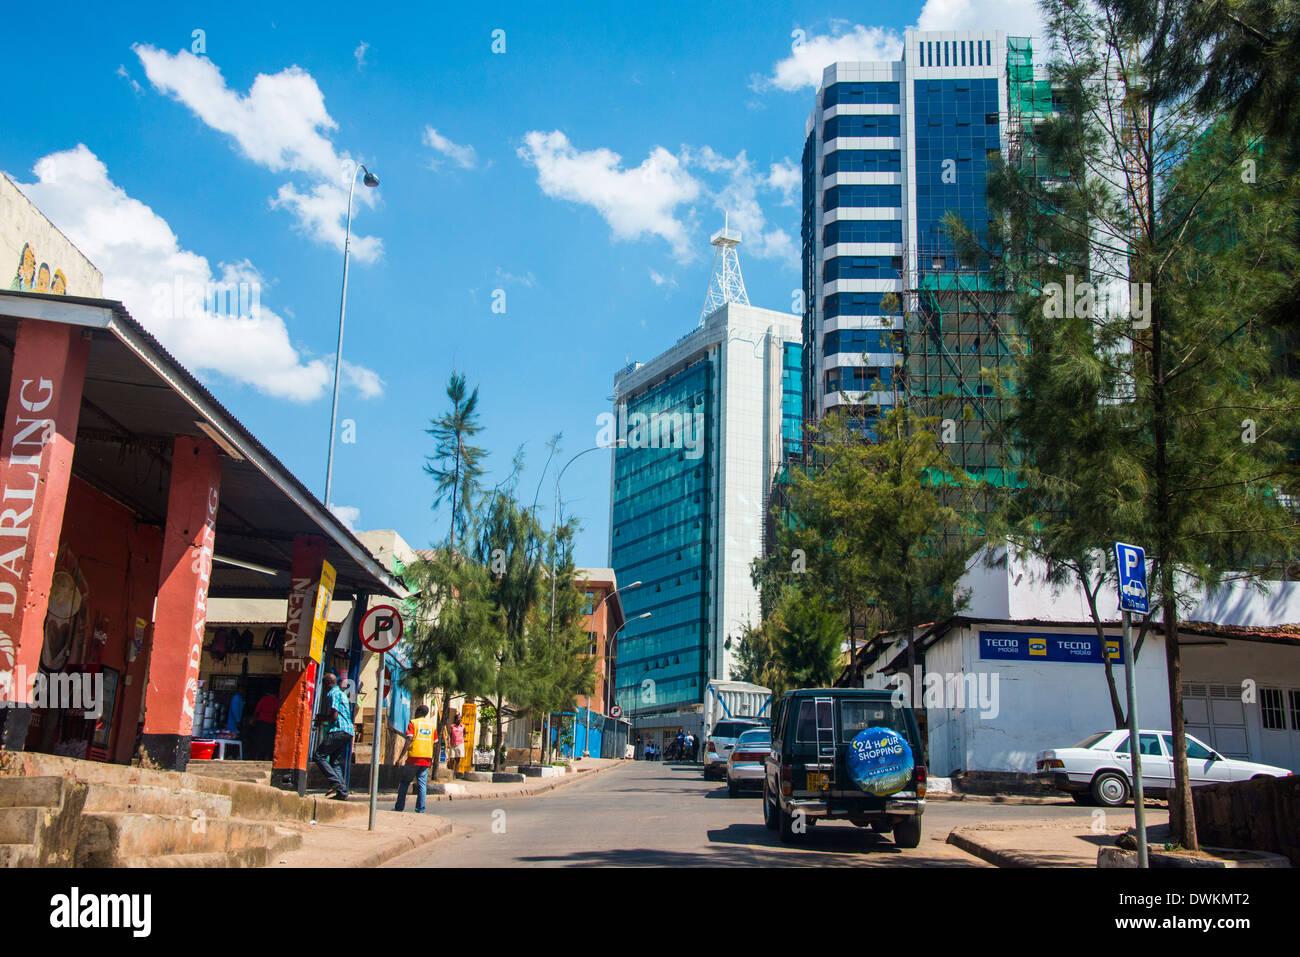 Downtown Kigali, Rwanda, Africa - Stock Image